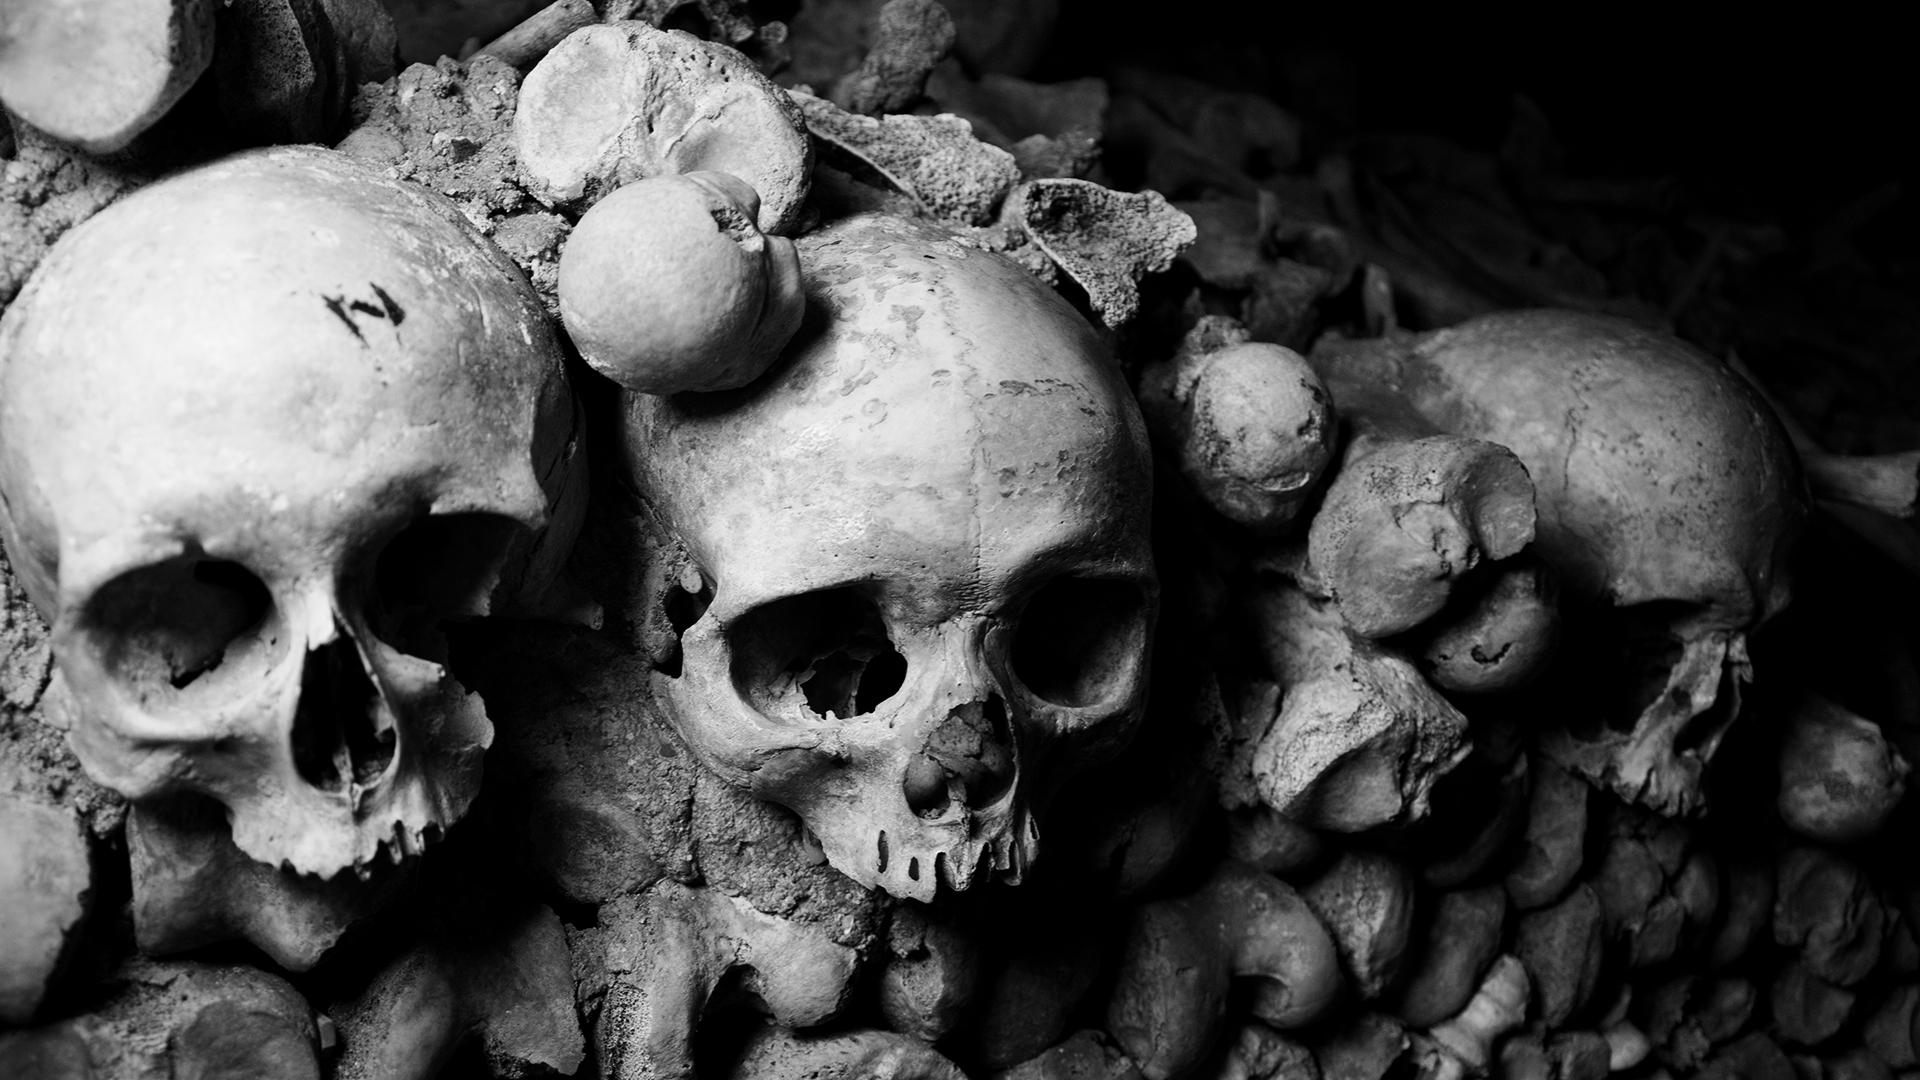 Skulls by dxd on deviantart - Scary skull backgrounds ...